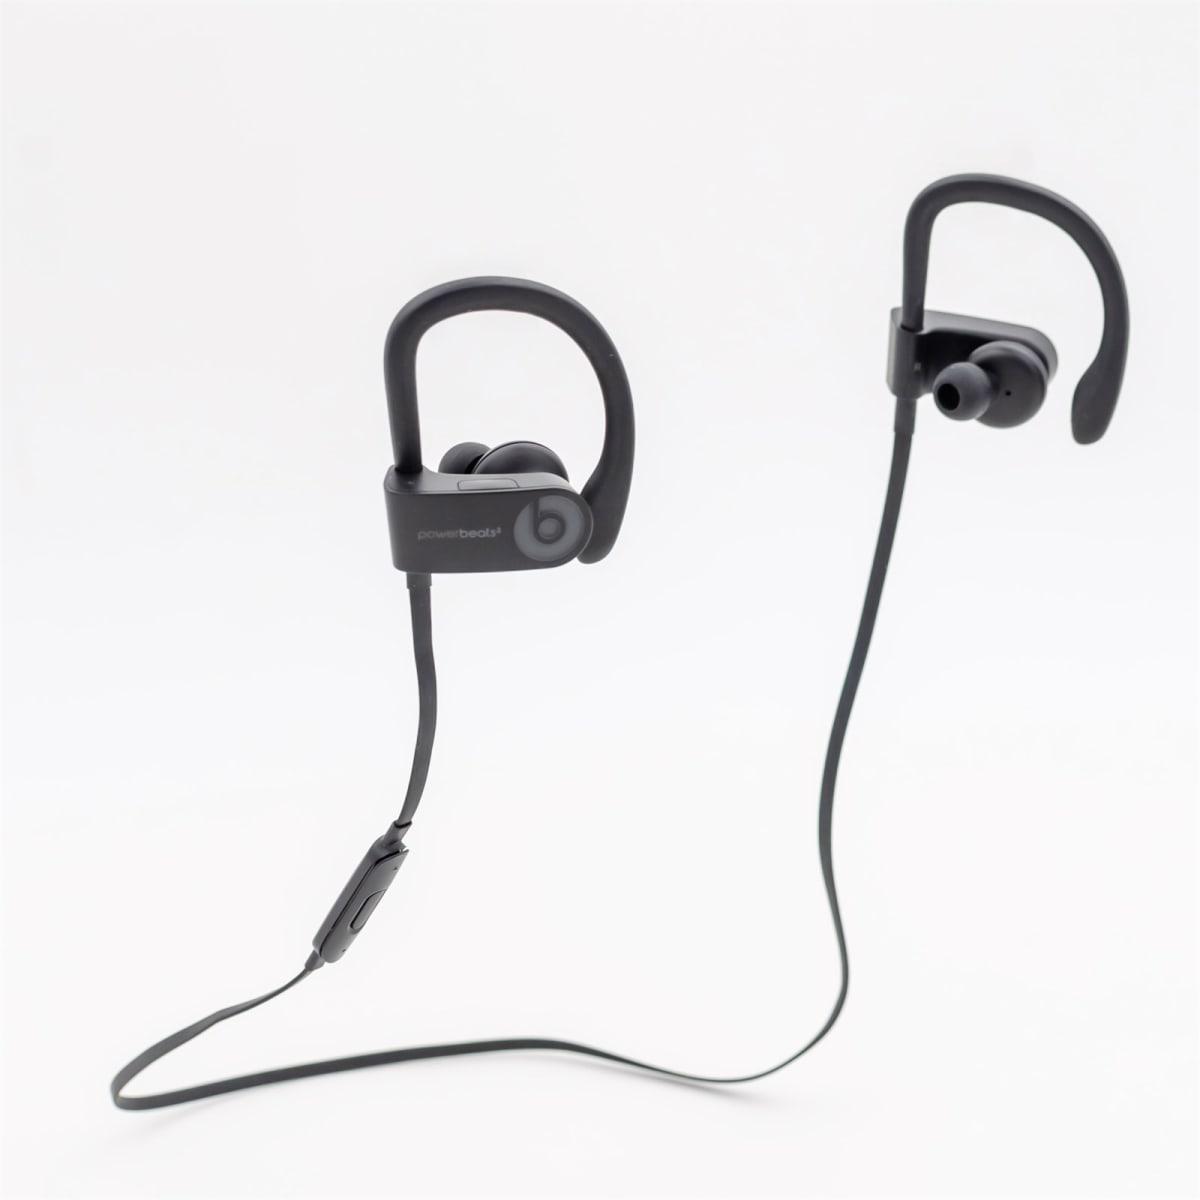 Refurbished Powerbeats3 Bluetooth Headphones Beats By Dre 70 Shipped Reg 150 Gina S Kokopelli